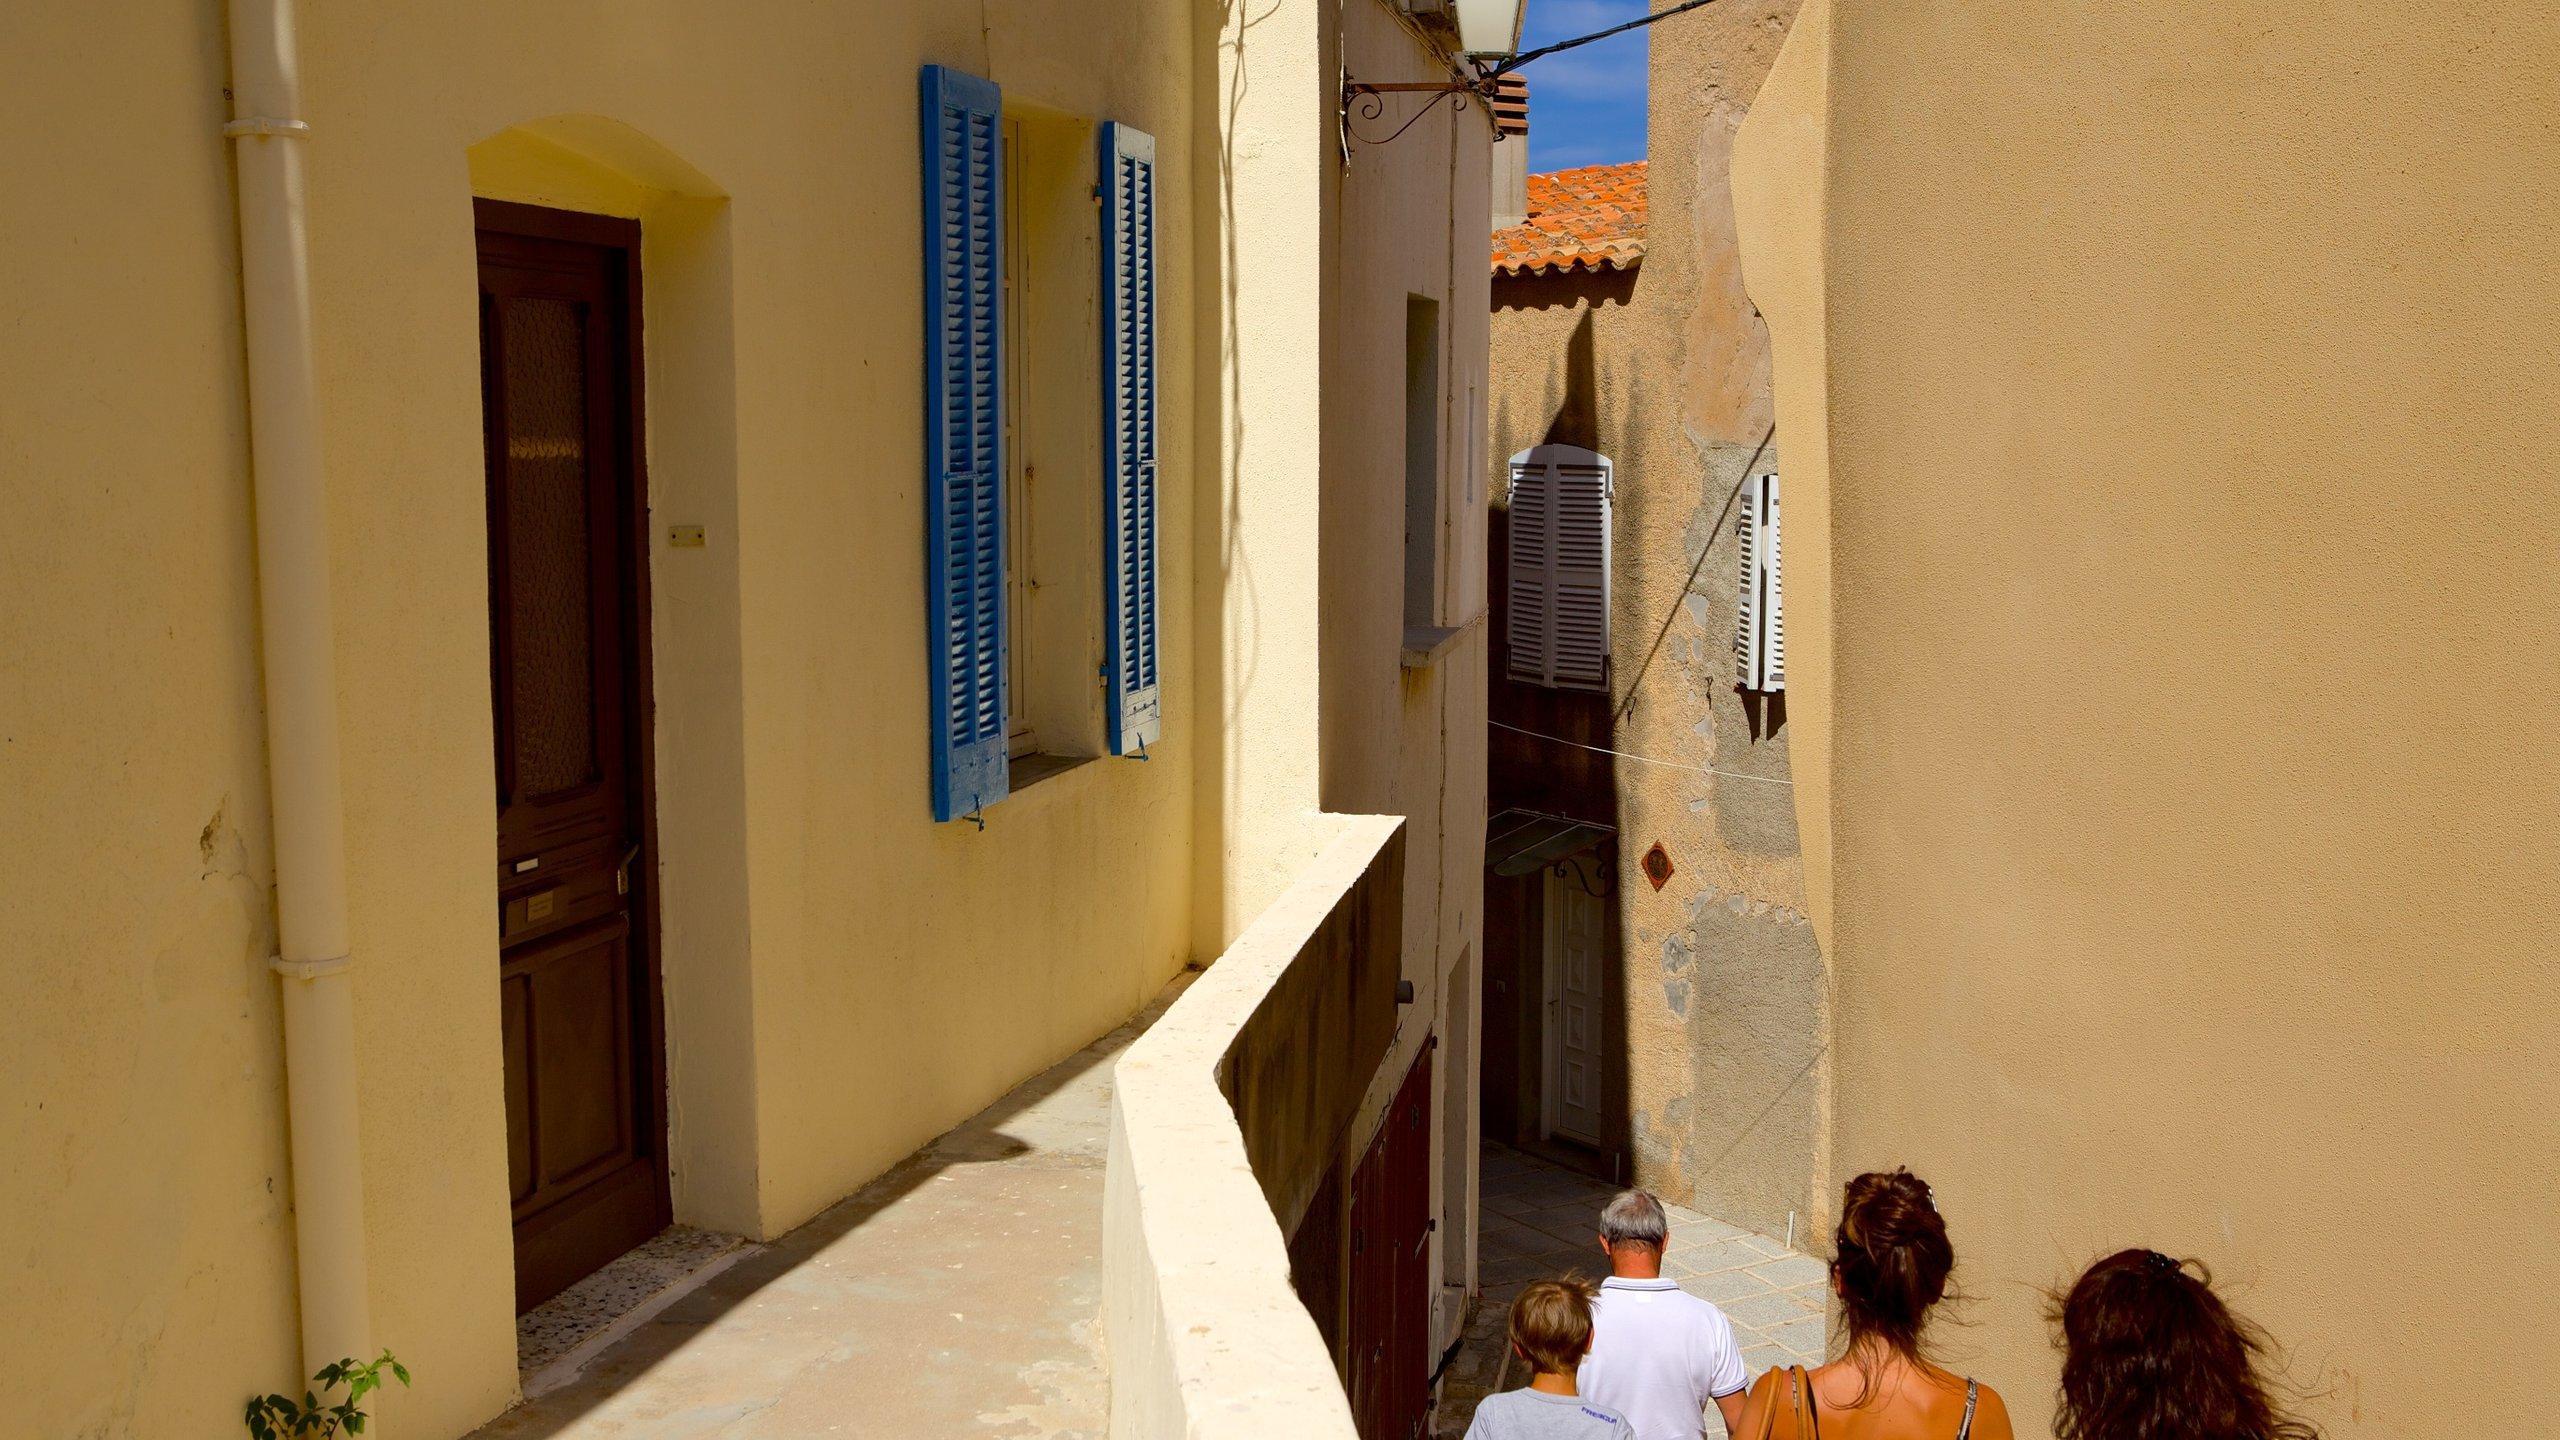 Calvi Balagne, Haute-Corse, France